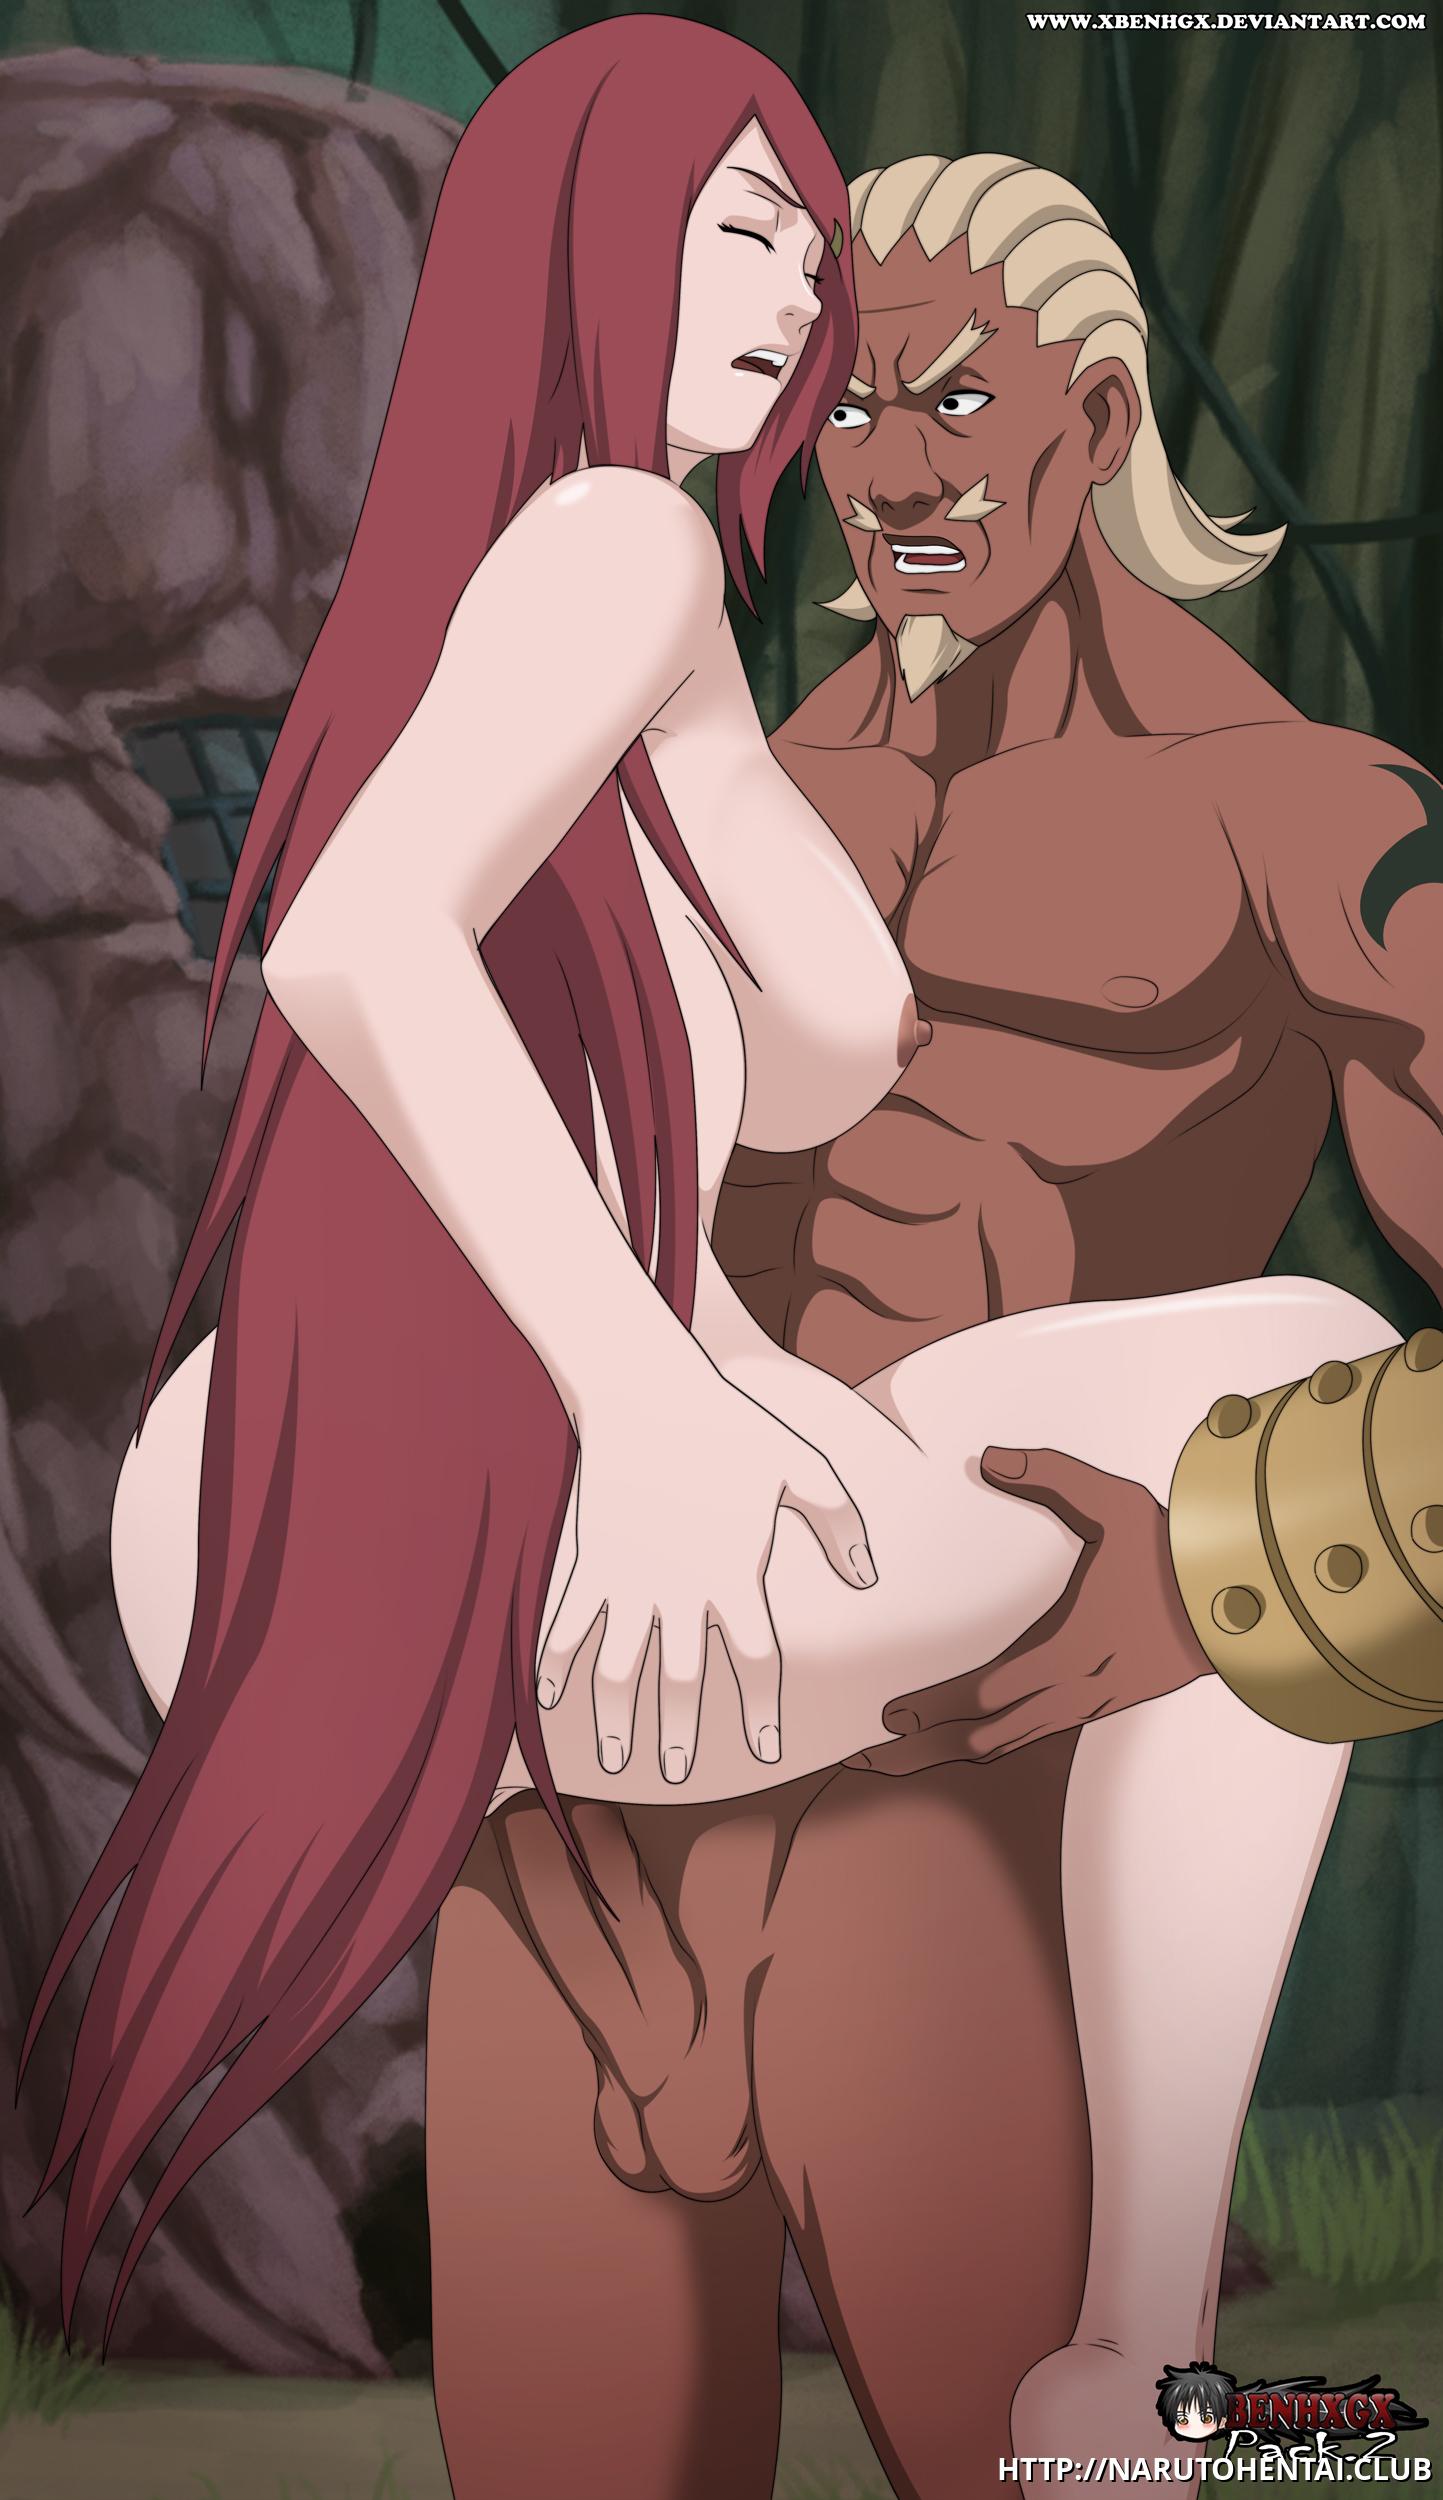 Anime shedemon sex nude naughty pornstar